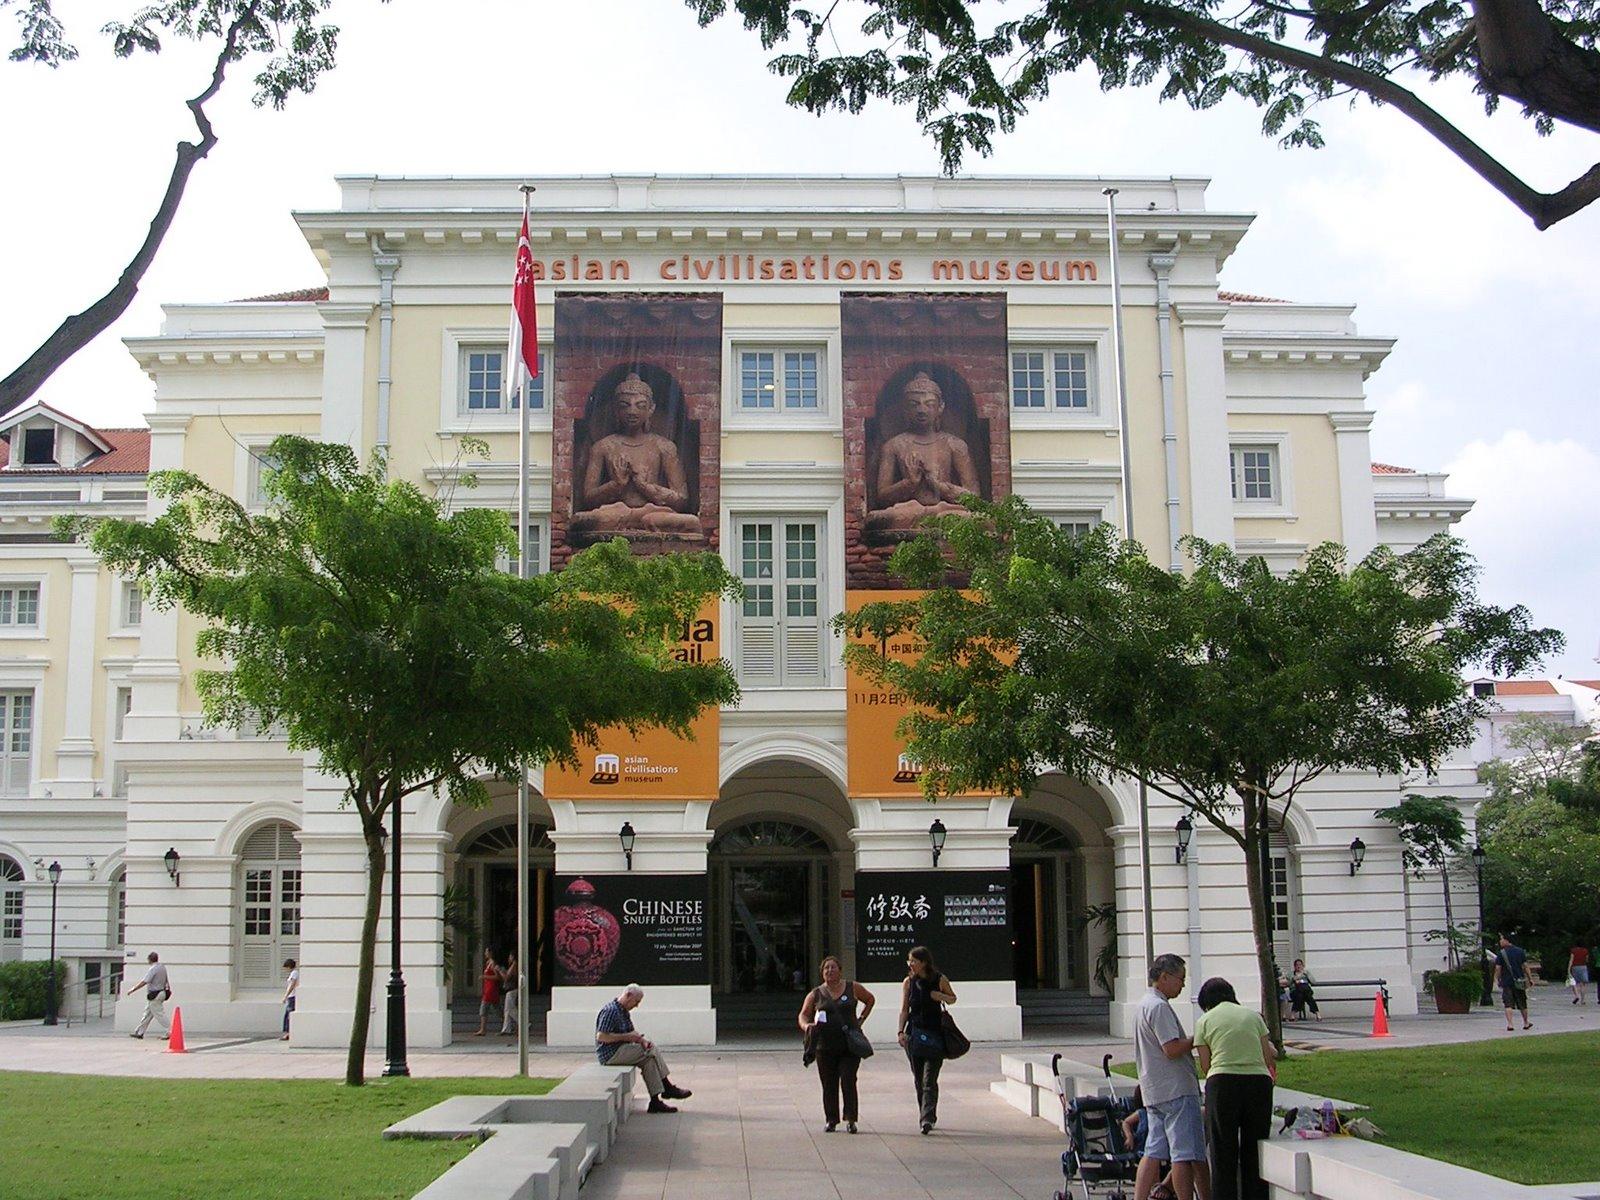 Фото музея Цивилизаций Азии